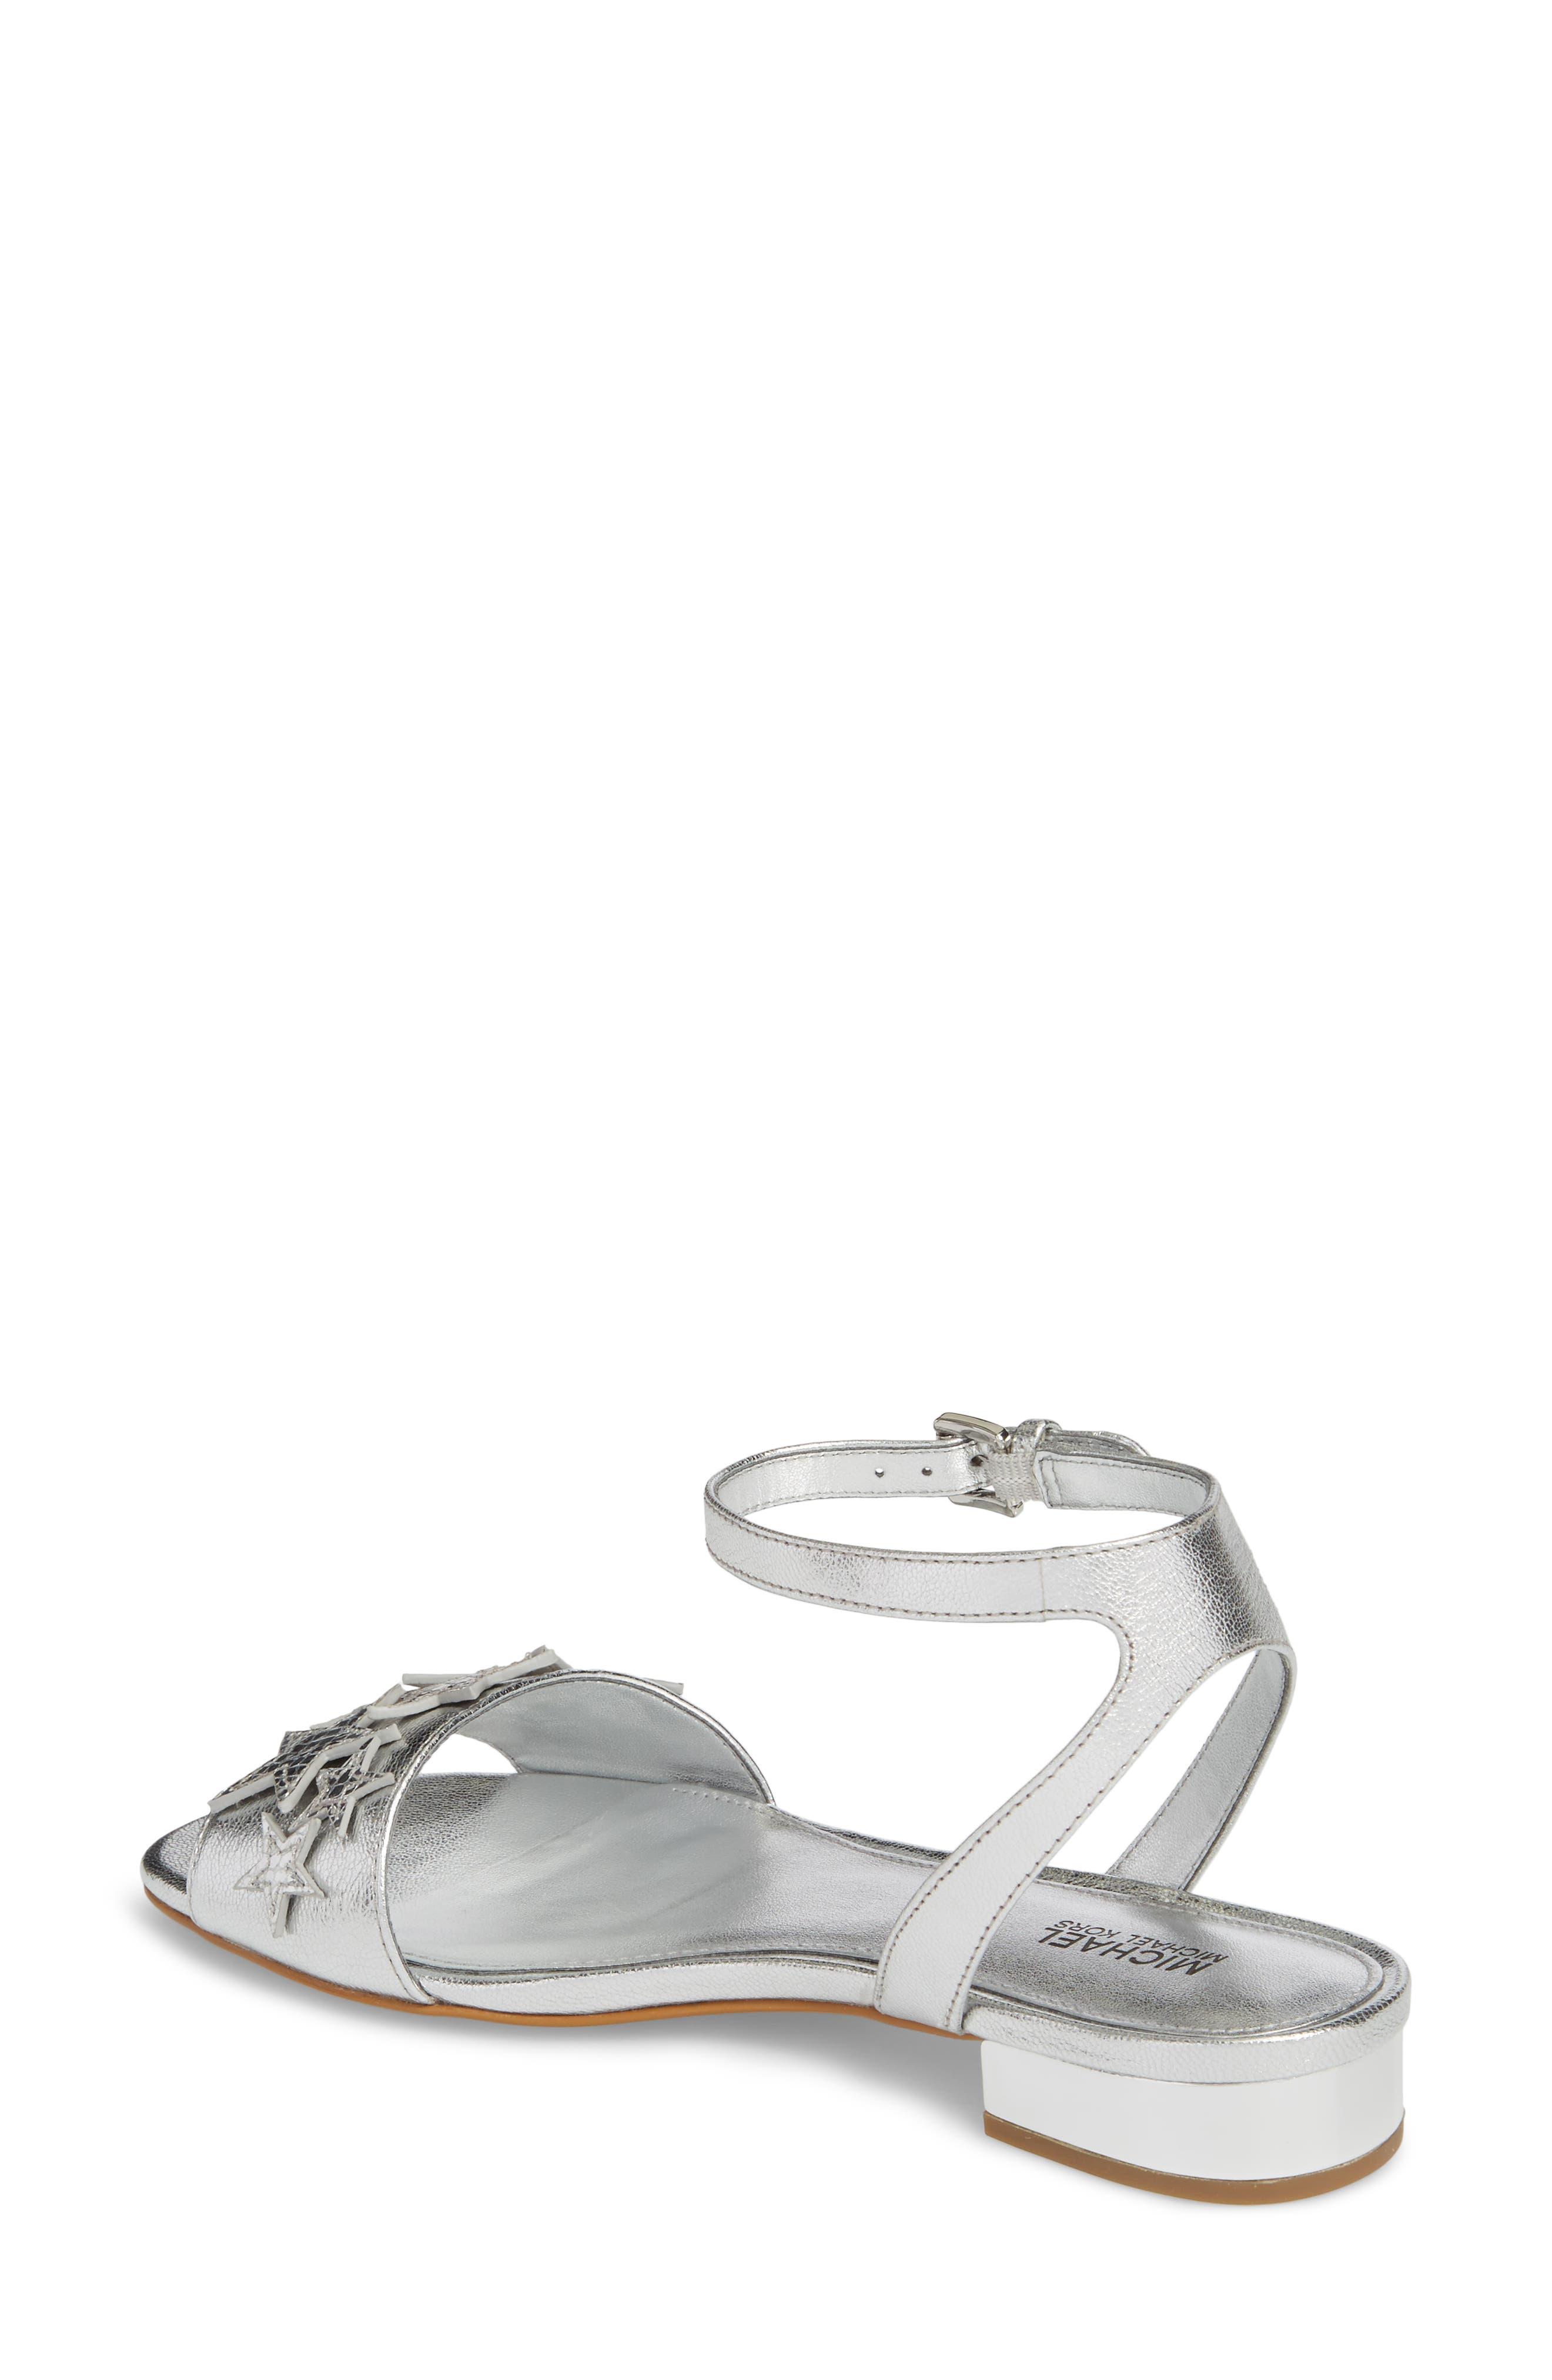 Lexie Star Embellished Sandal,                             Alternate thumbnail 2, color,                             040